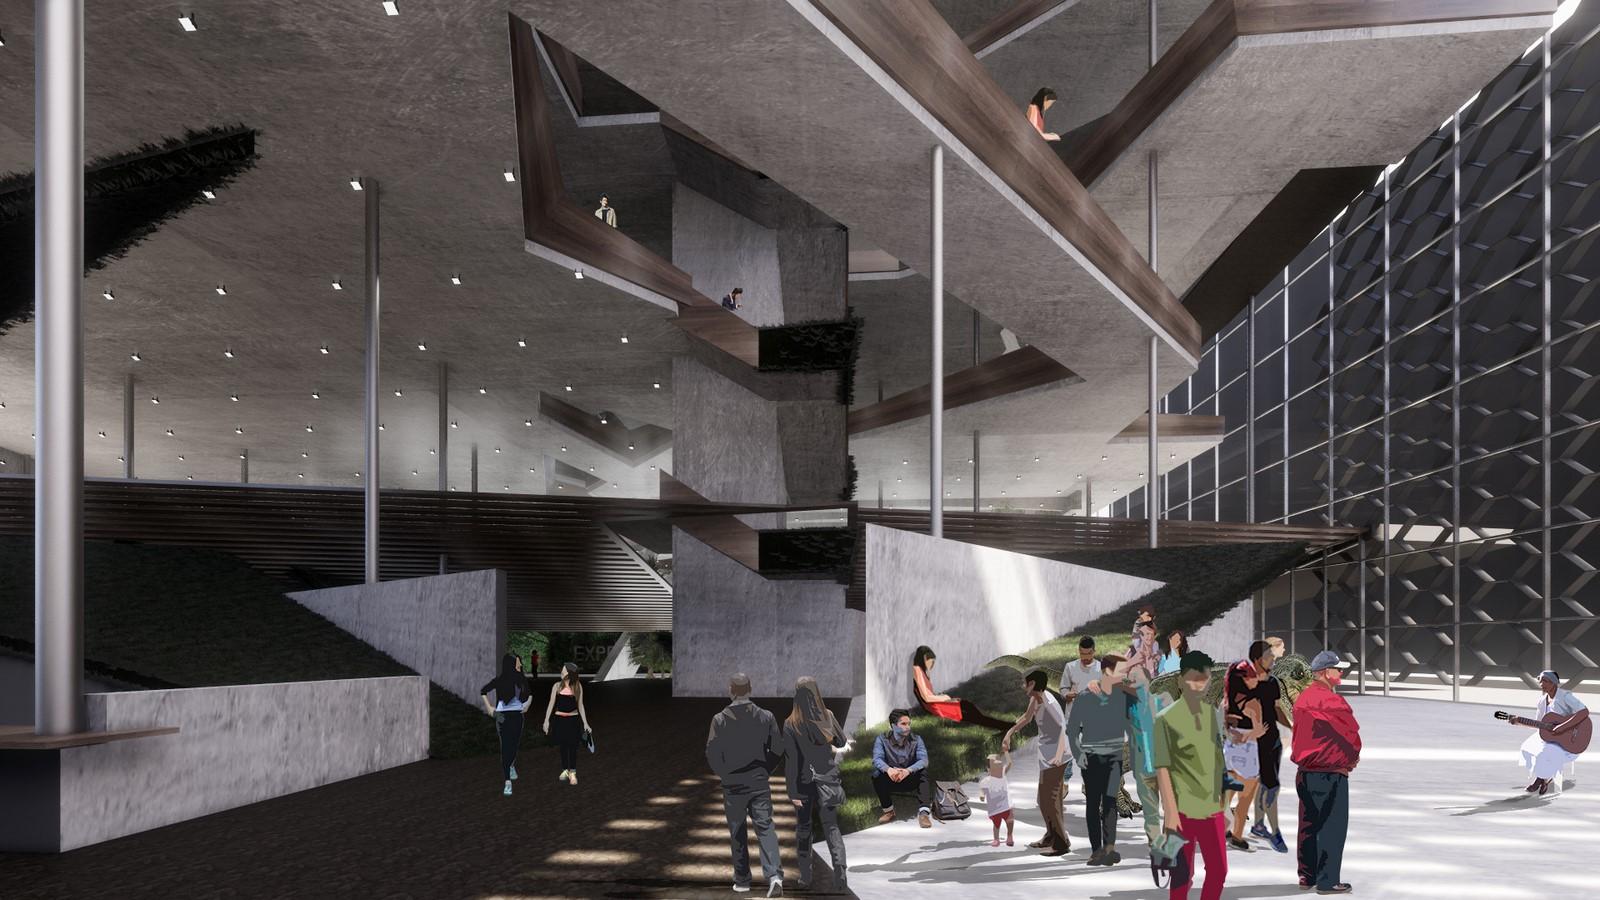 Architecture Concepts - Sensory perception: - Sheet1